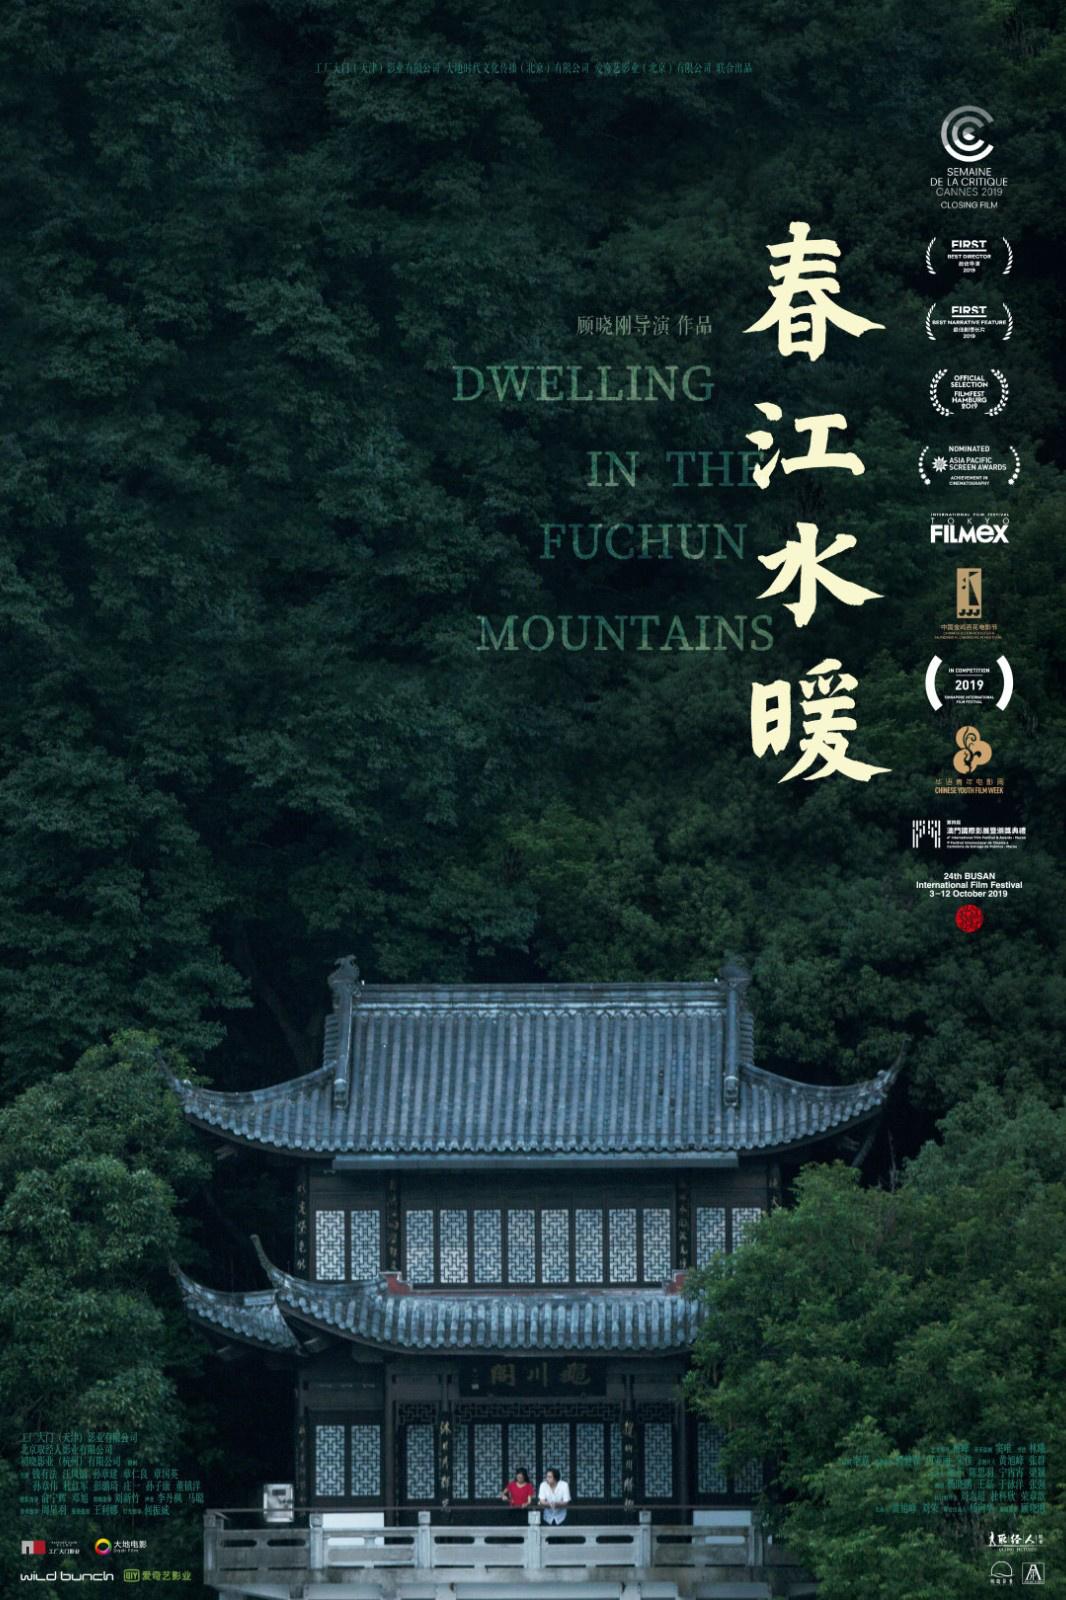 allbet欧博集团:9部影片入围上海国际电影节电影频道传媒关注单元 第3张